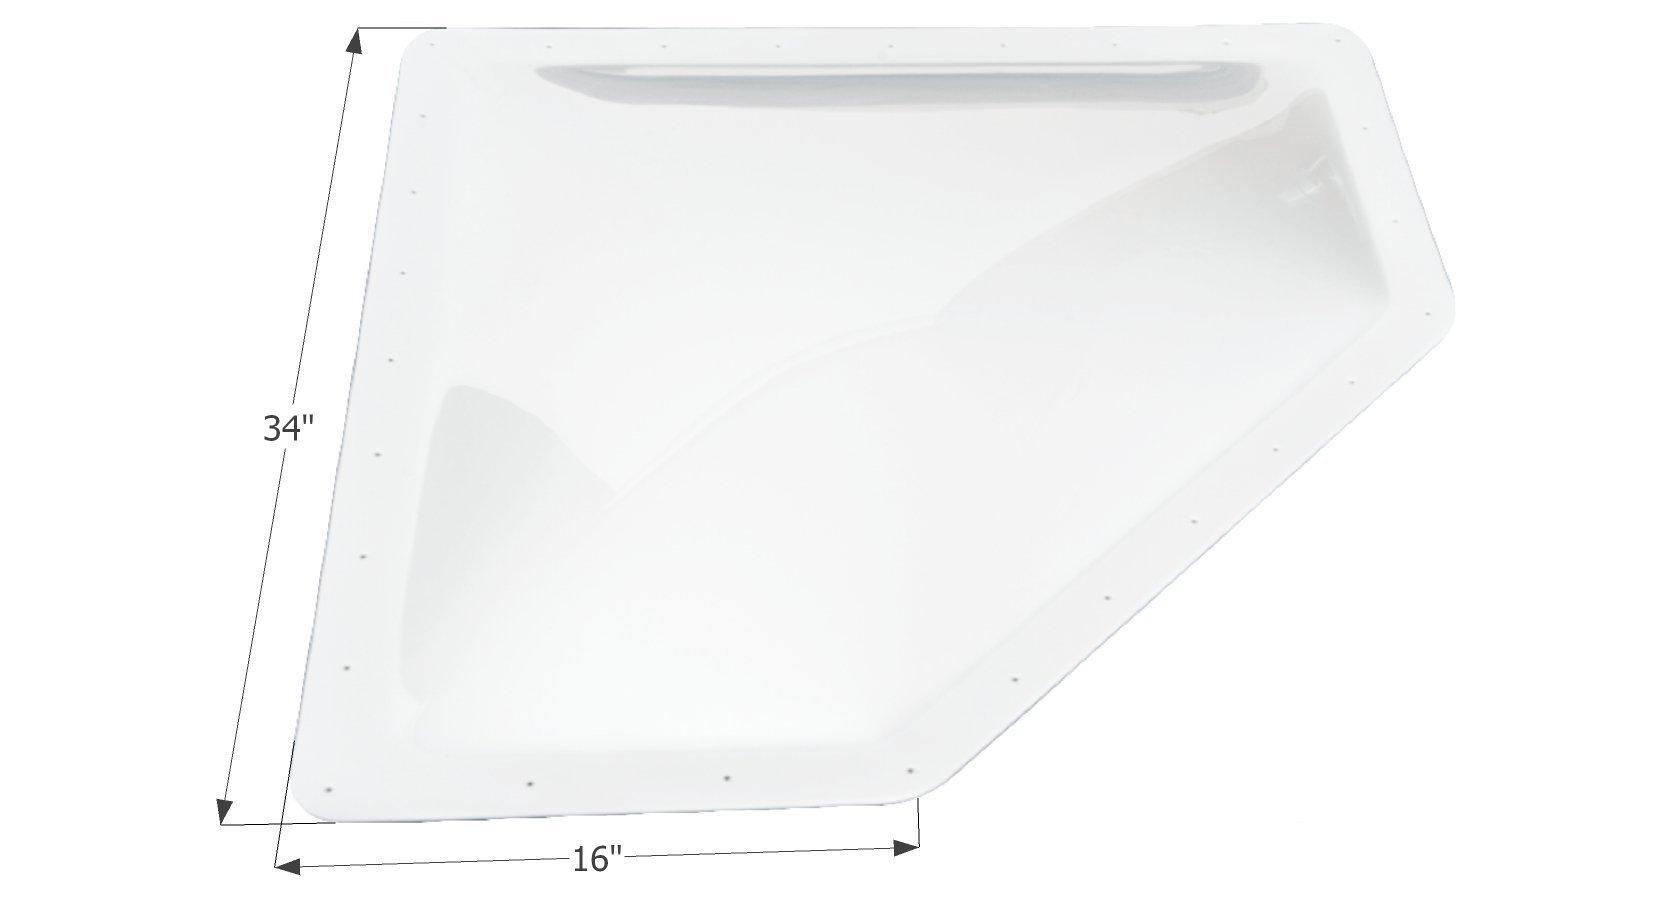 ICON 01871 RV Skylight